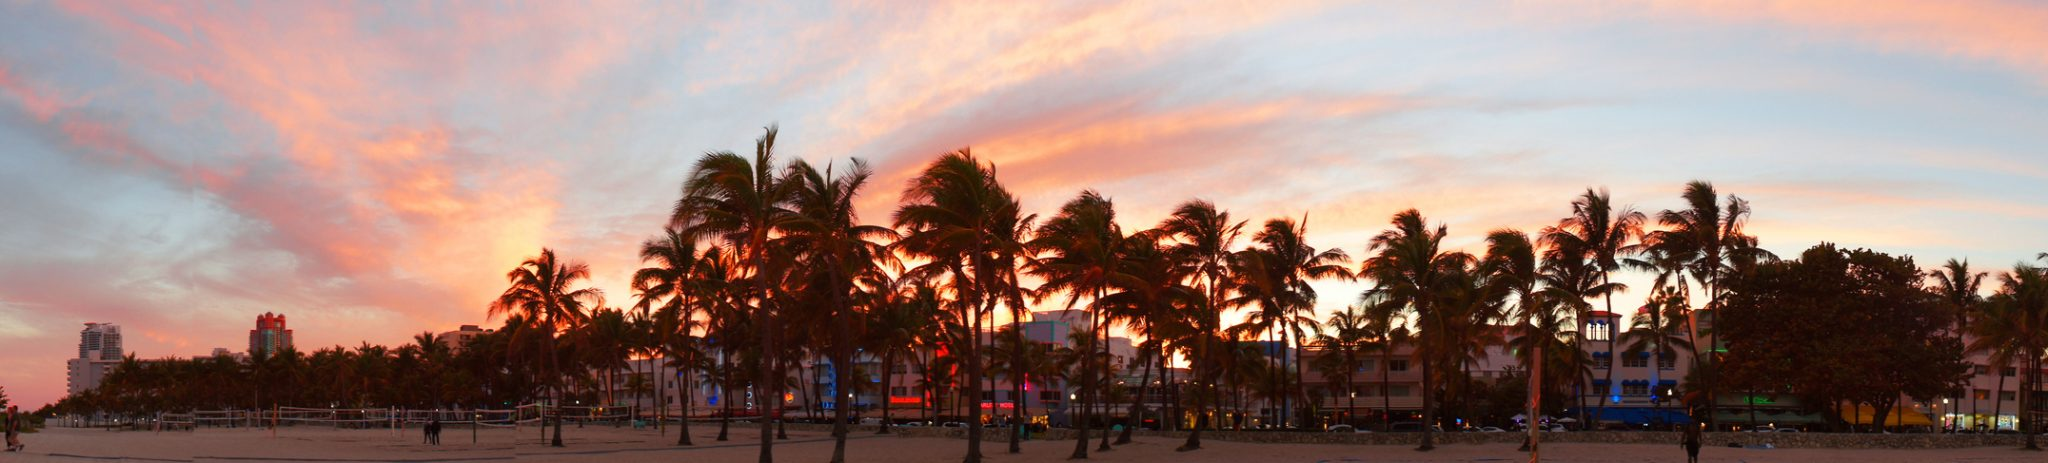 On The Beach In South Beach